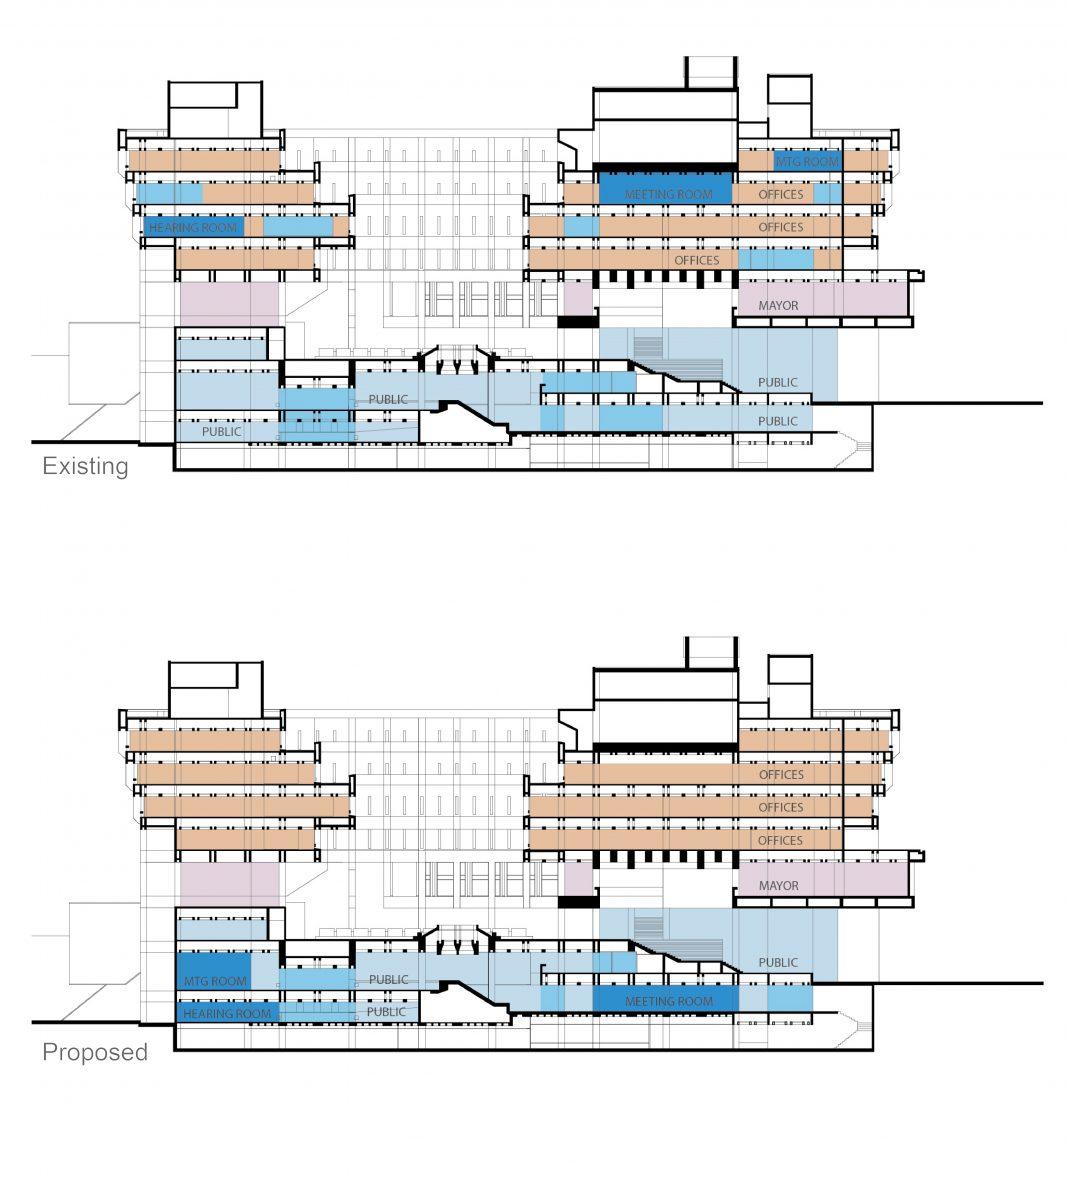 Rethink City Hall: Boston City Hall & Plaza Master Plan